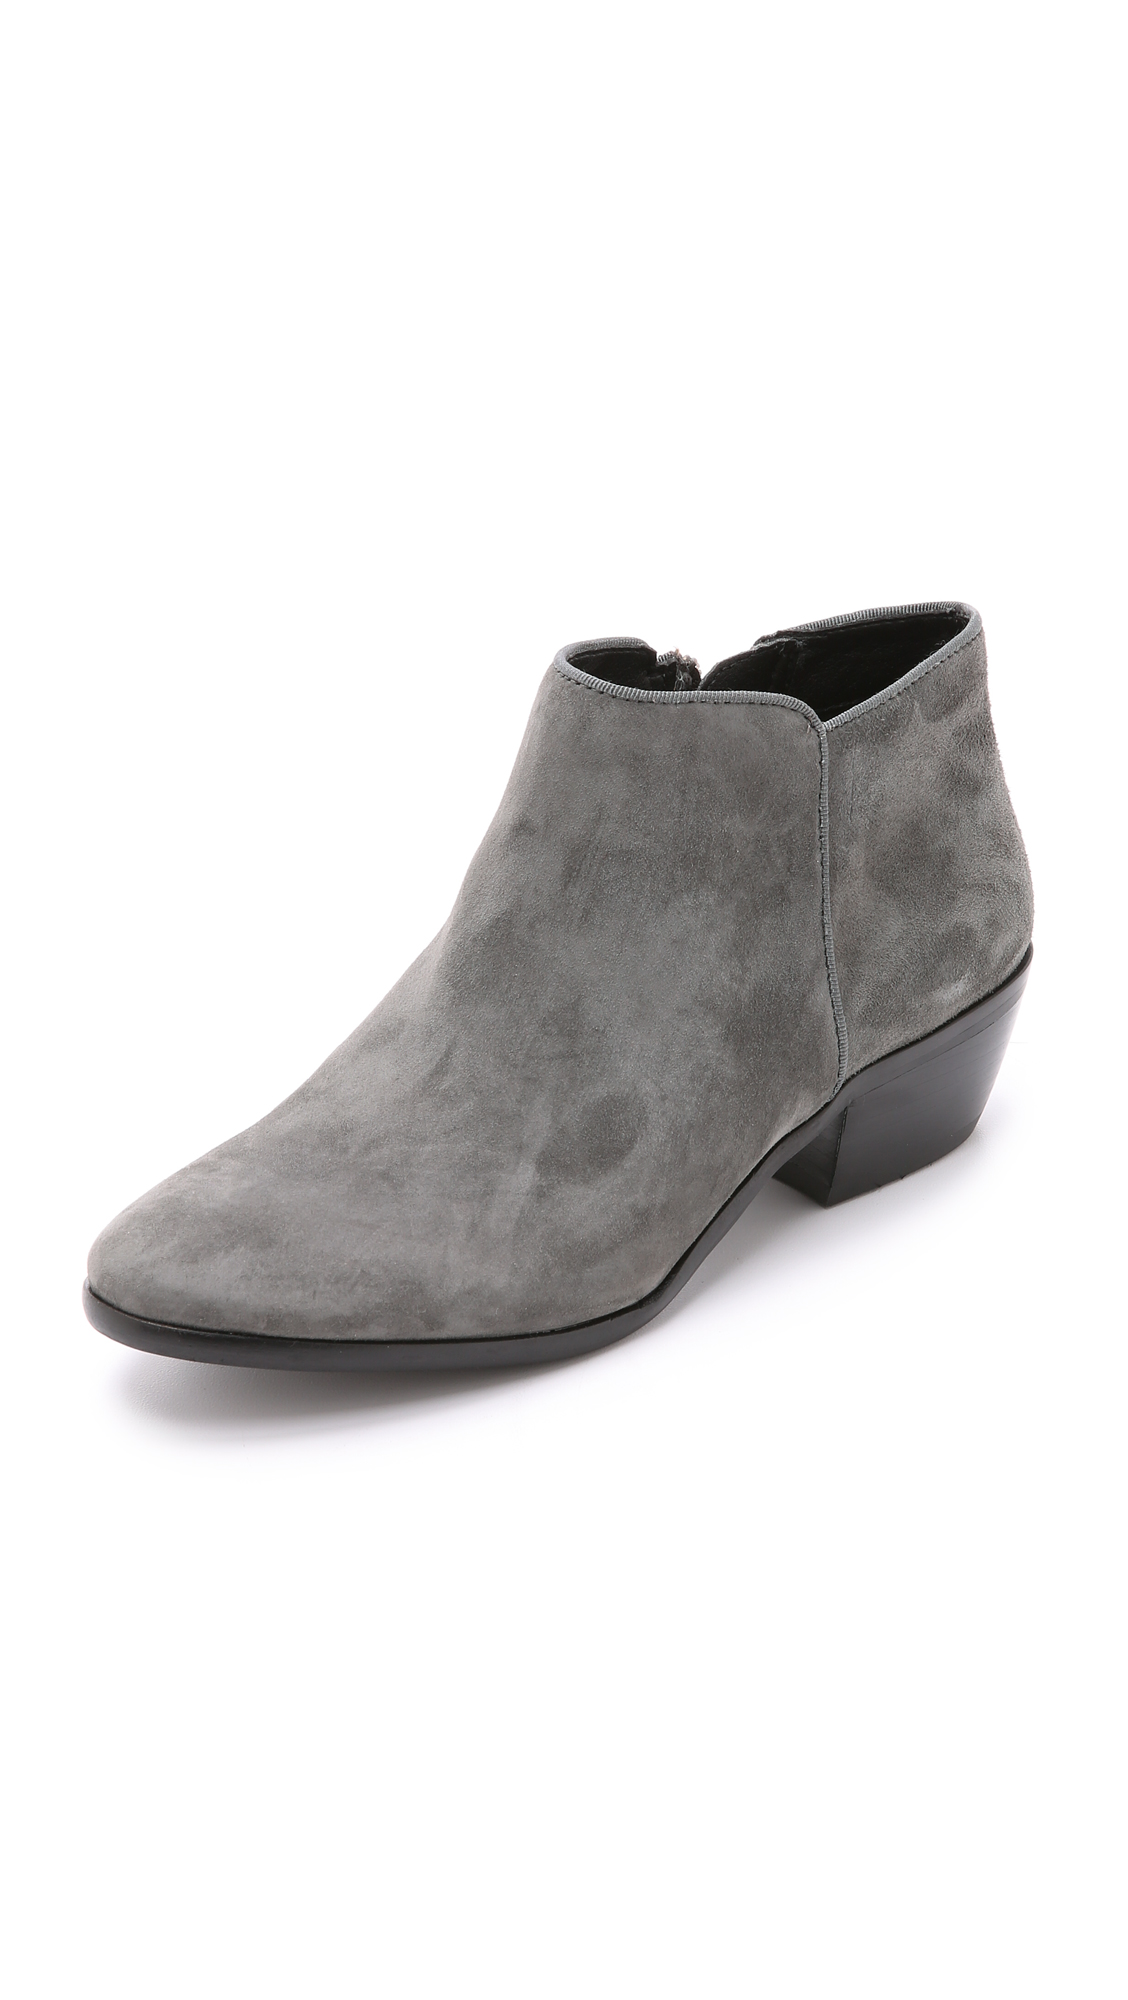 af7633435559 Sam Edelman Petty Suede Ankle Boot